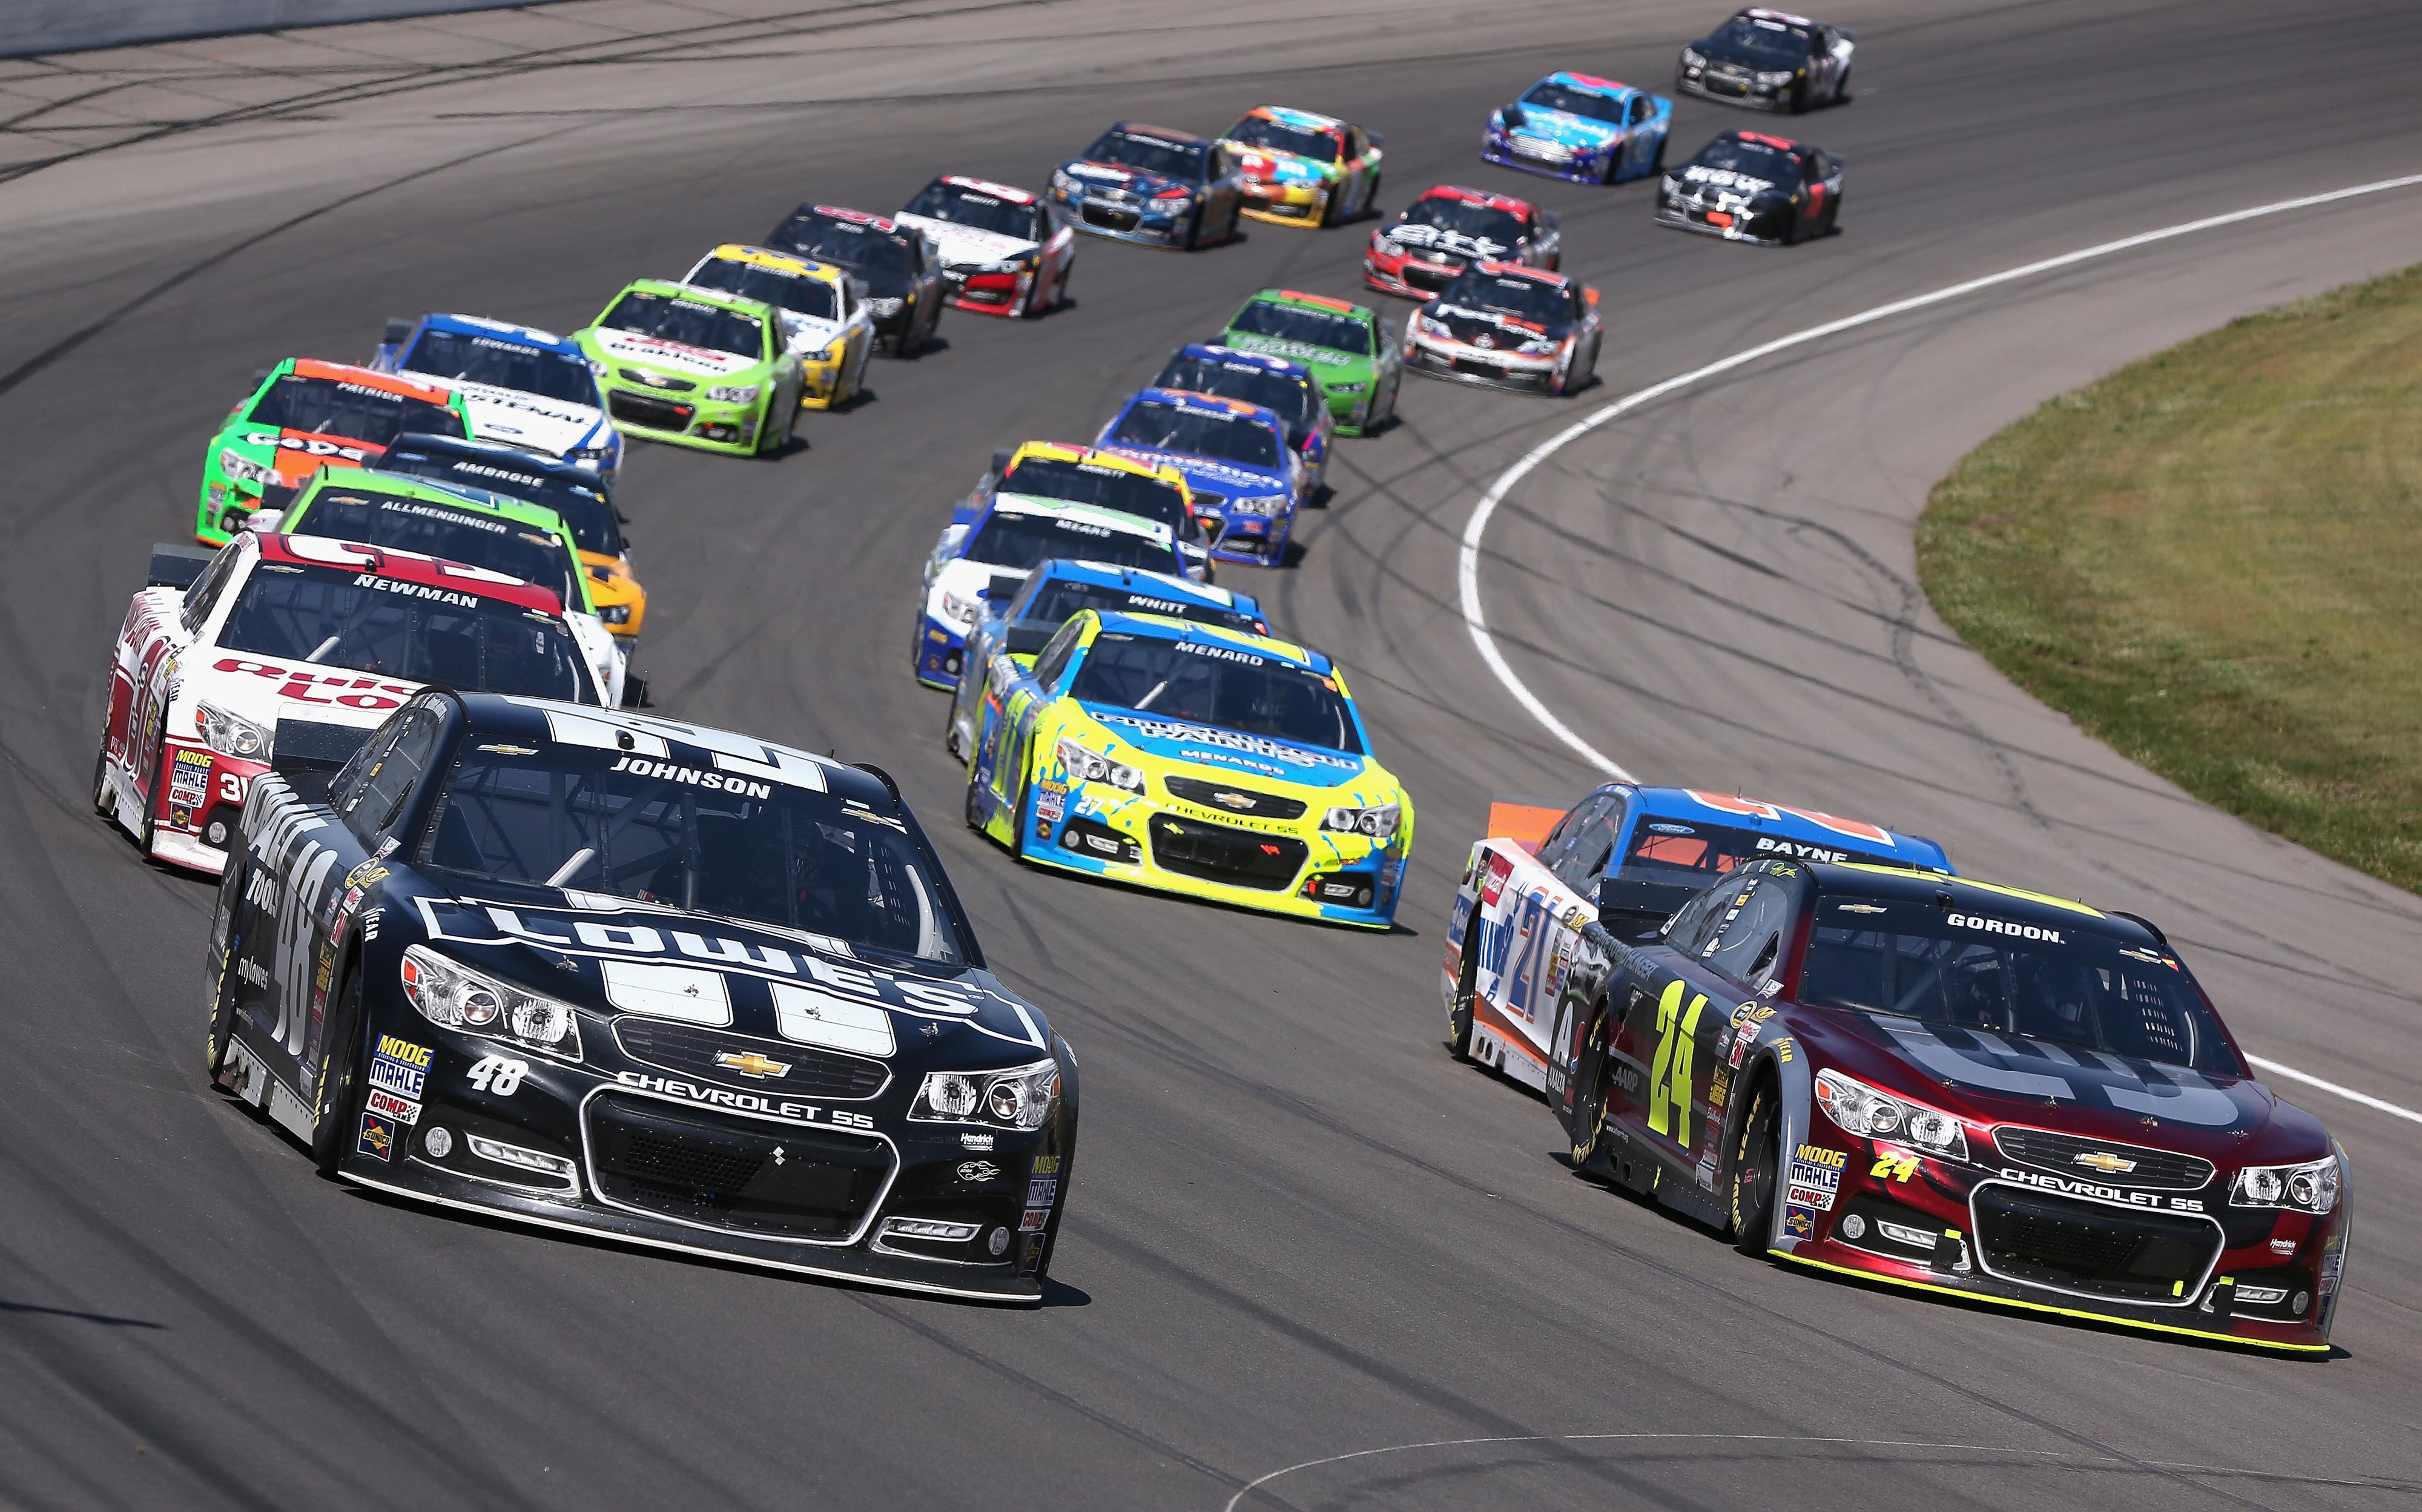 NASCAR Michigan 2014 weekend recap: Powerful engines propel Hendrick dominance